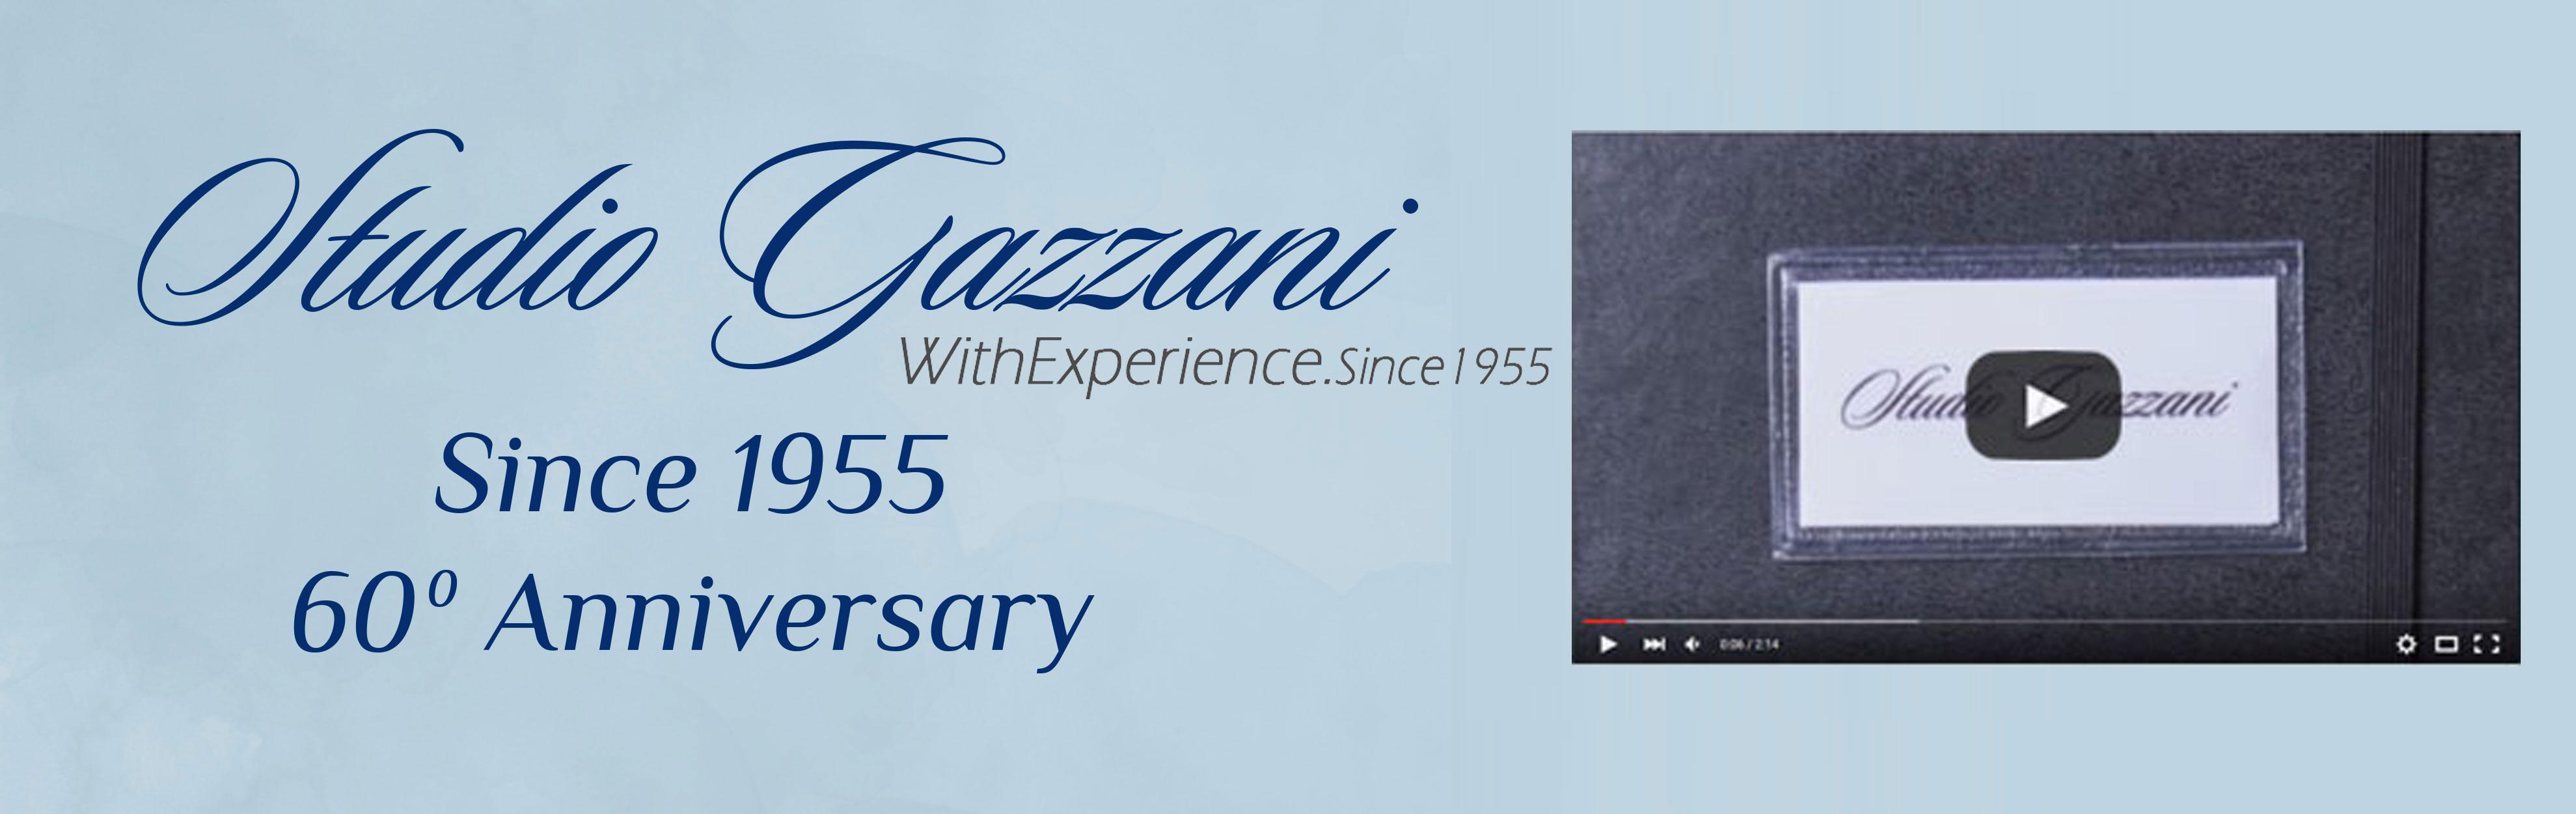 StudioGazzani, commercialista verona, accountant verona